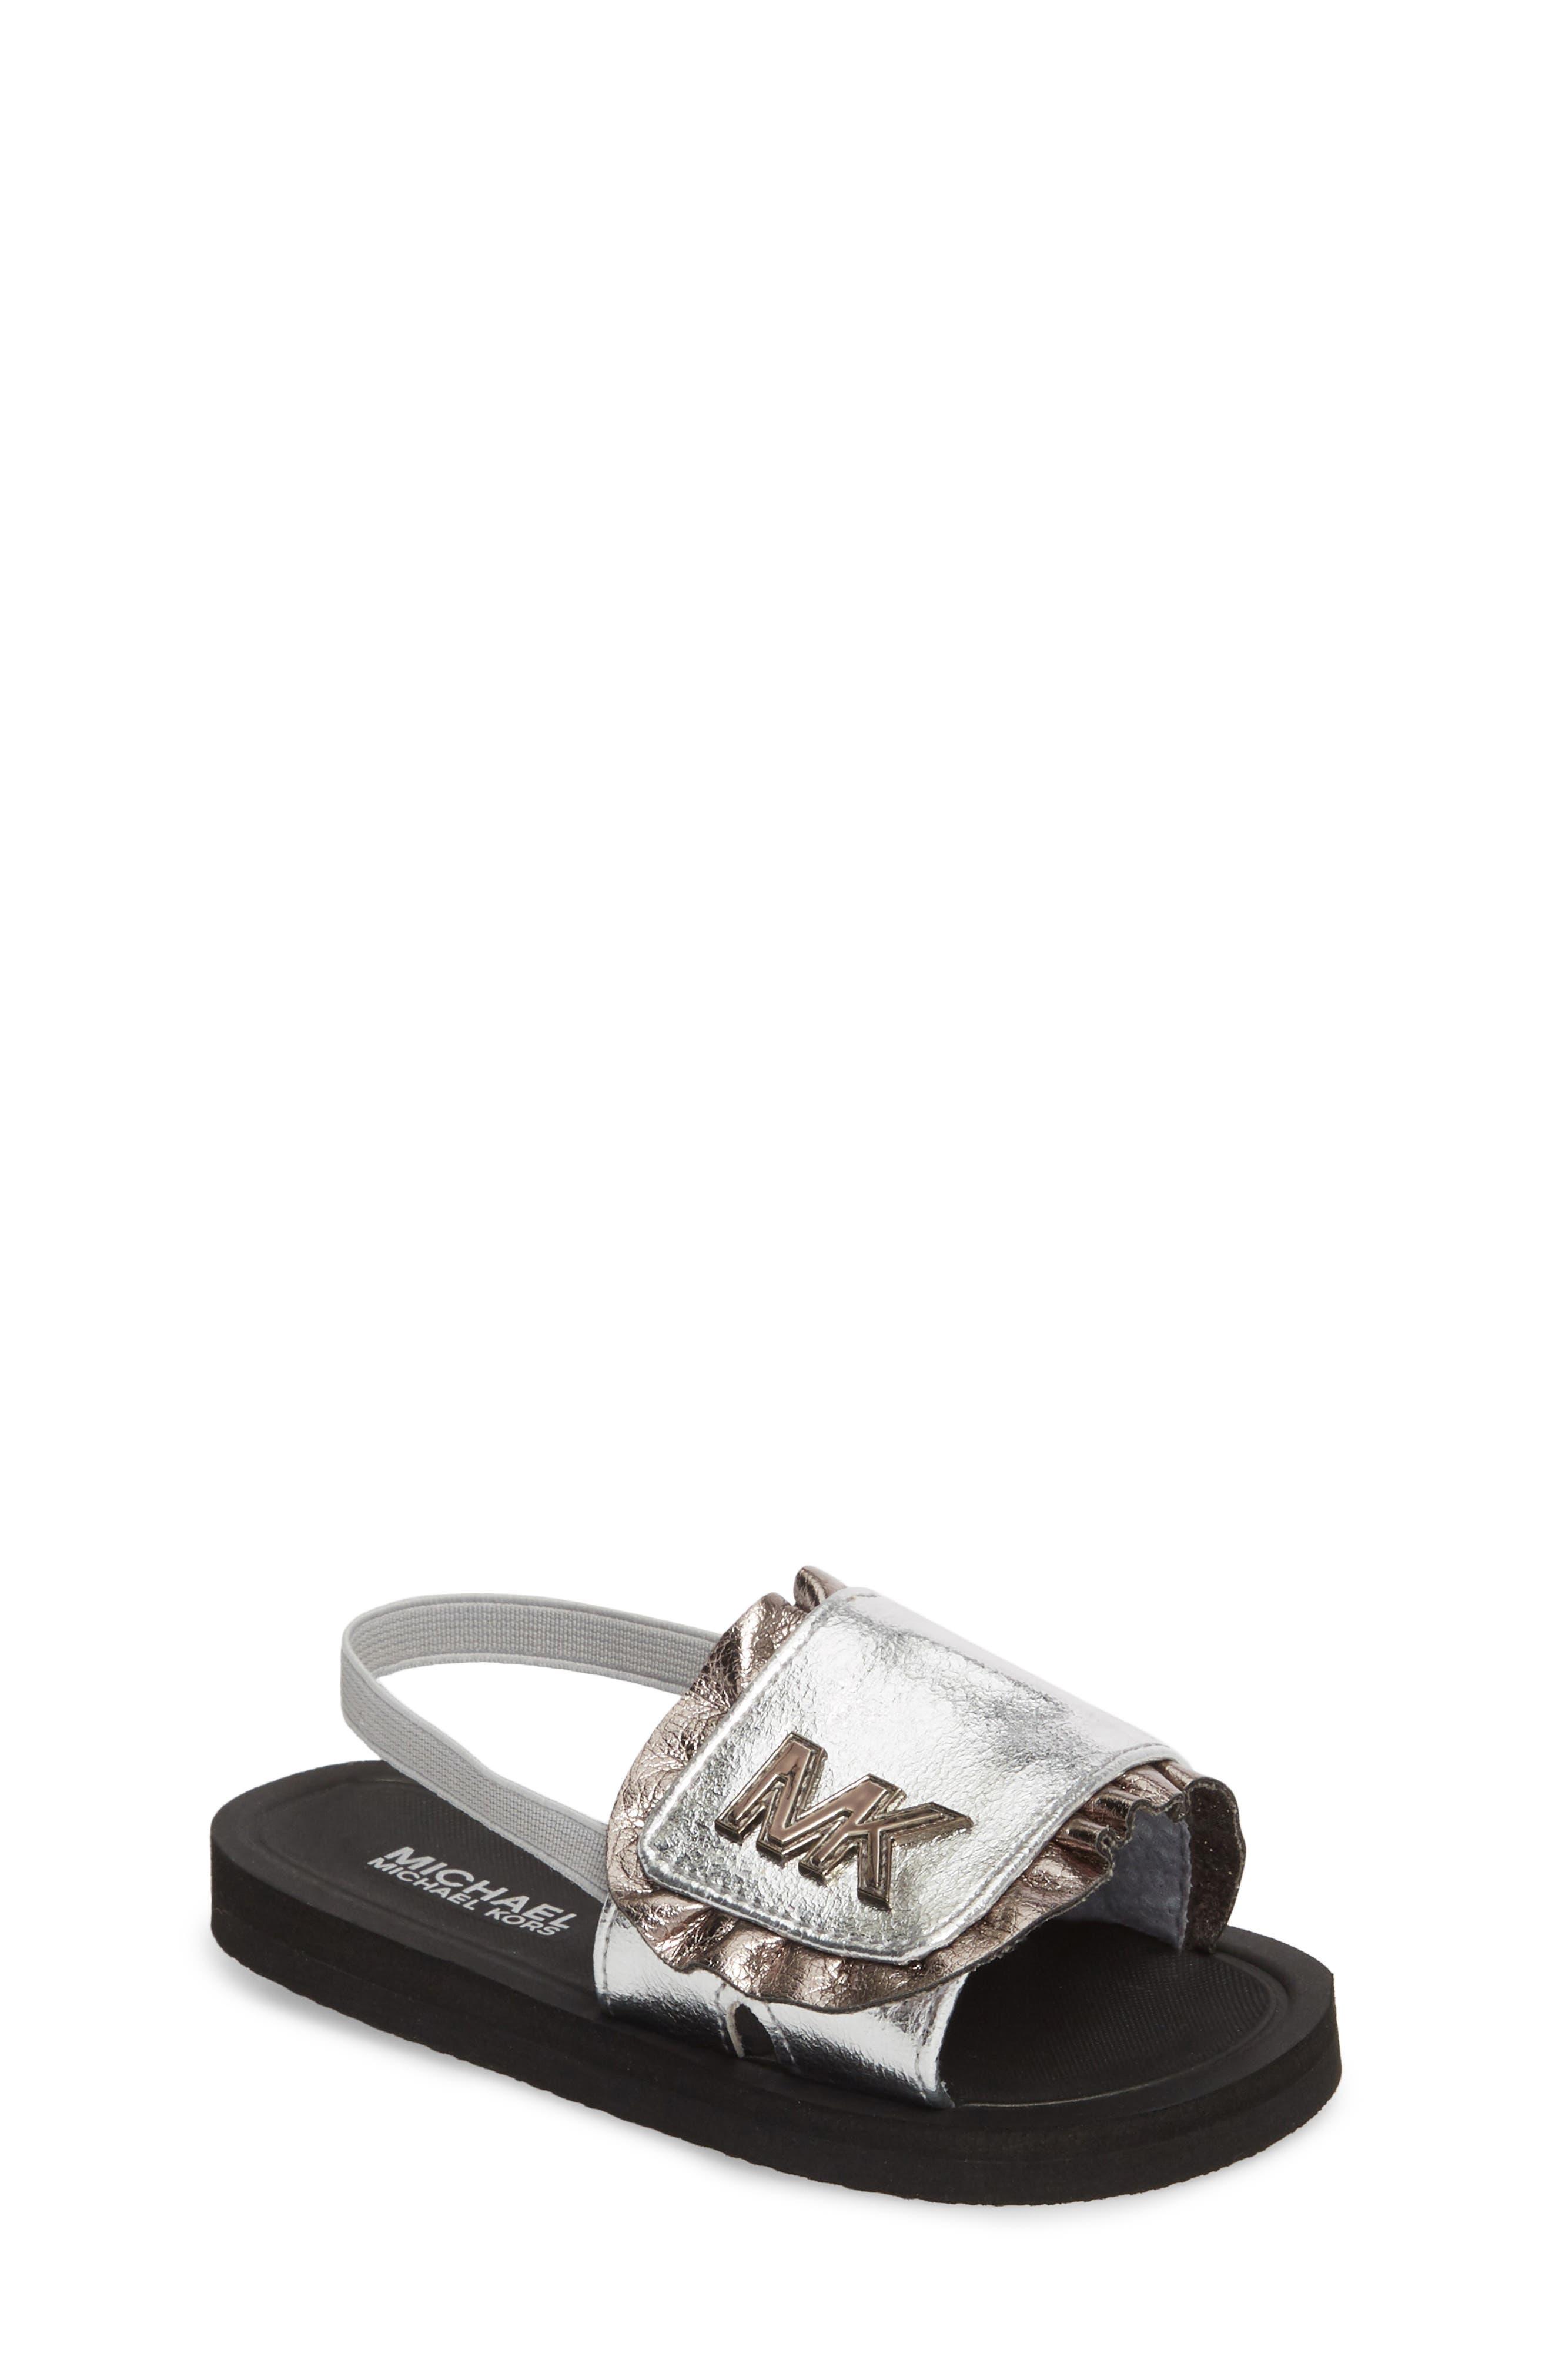 Eli Jack Metallic Sandal,                         Main,                         color, Silver